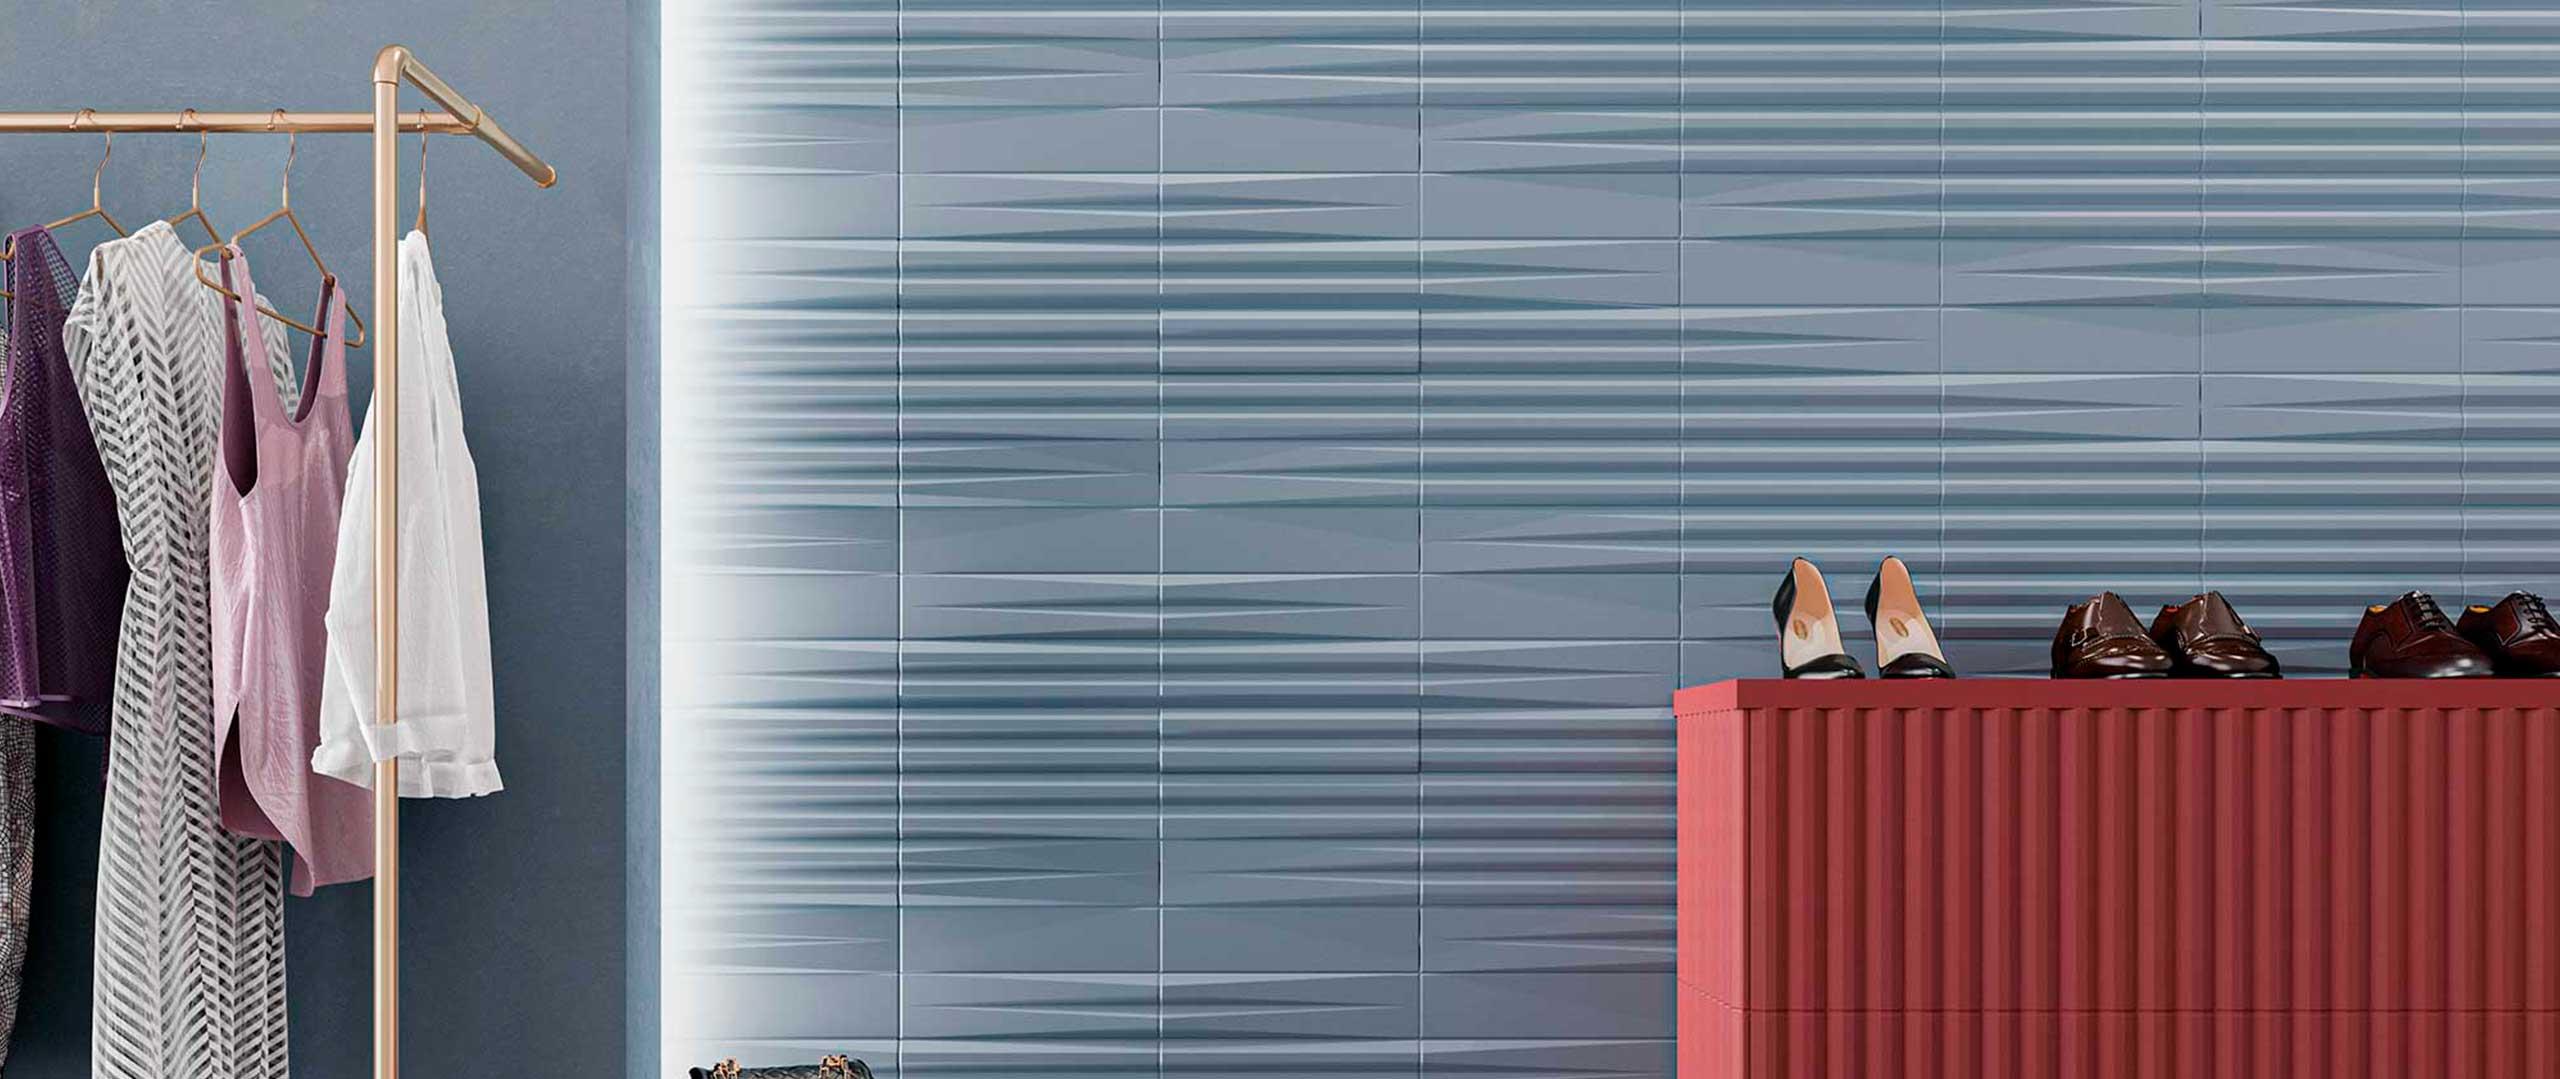 WOW DESIGN Stripes